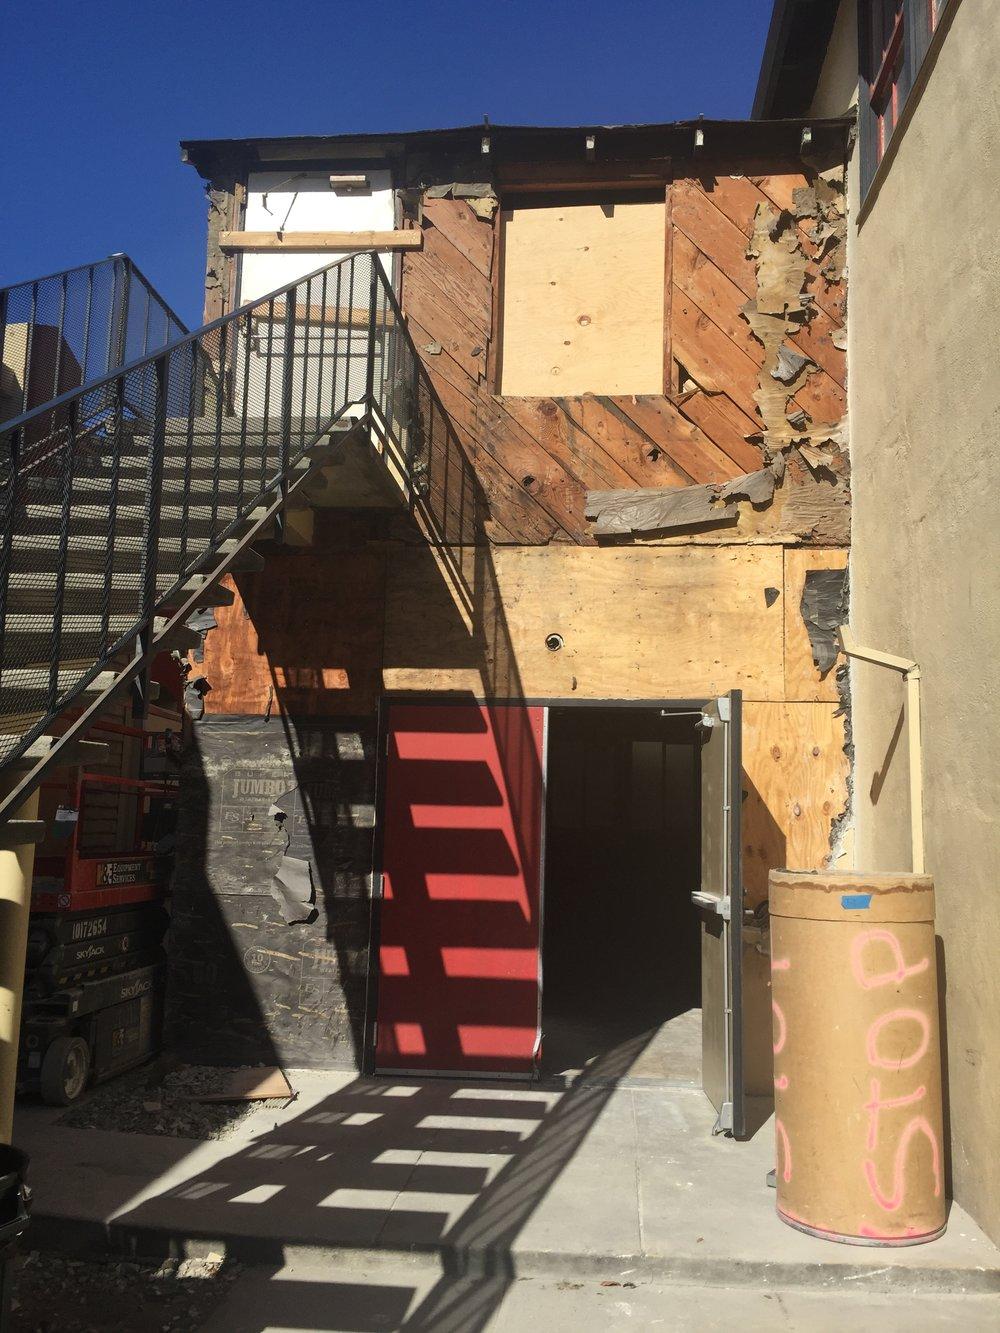 2018-10-12 Demolition of building exterior